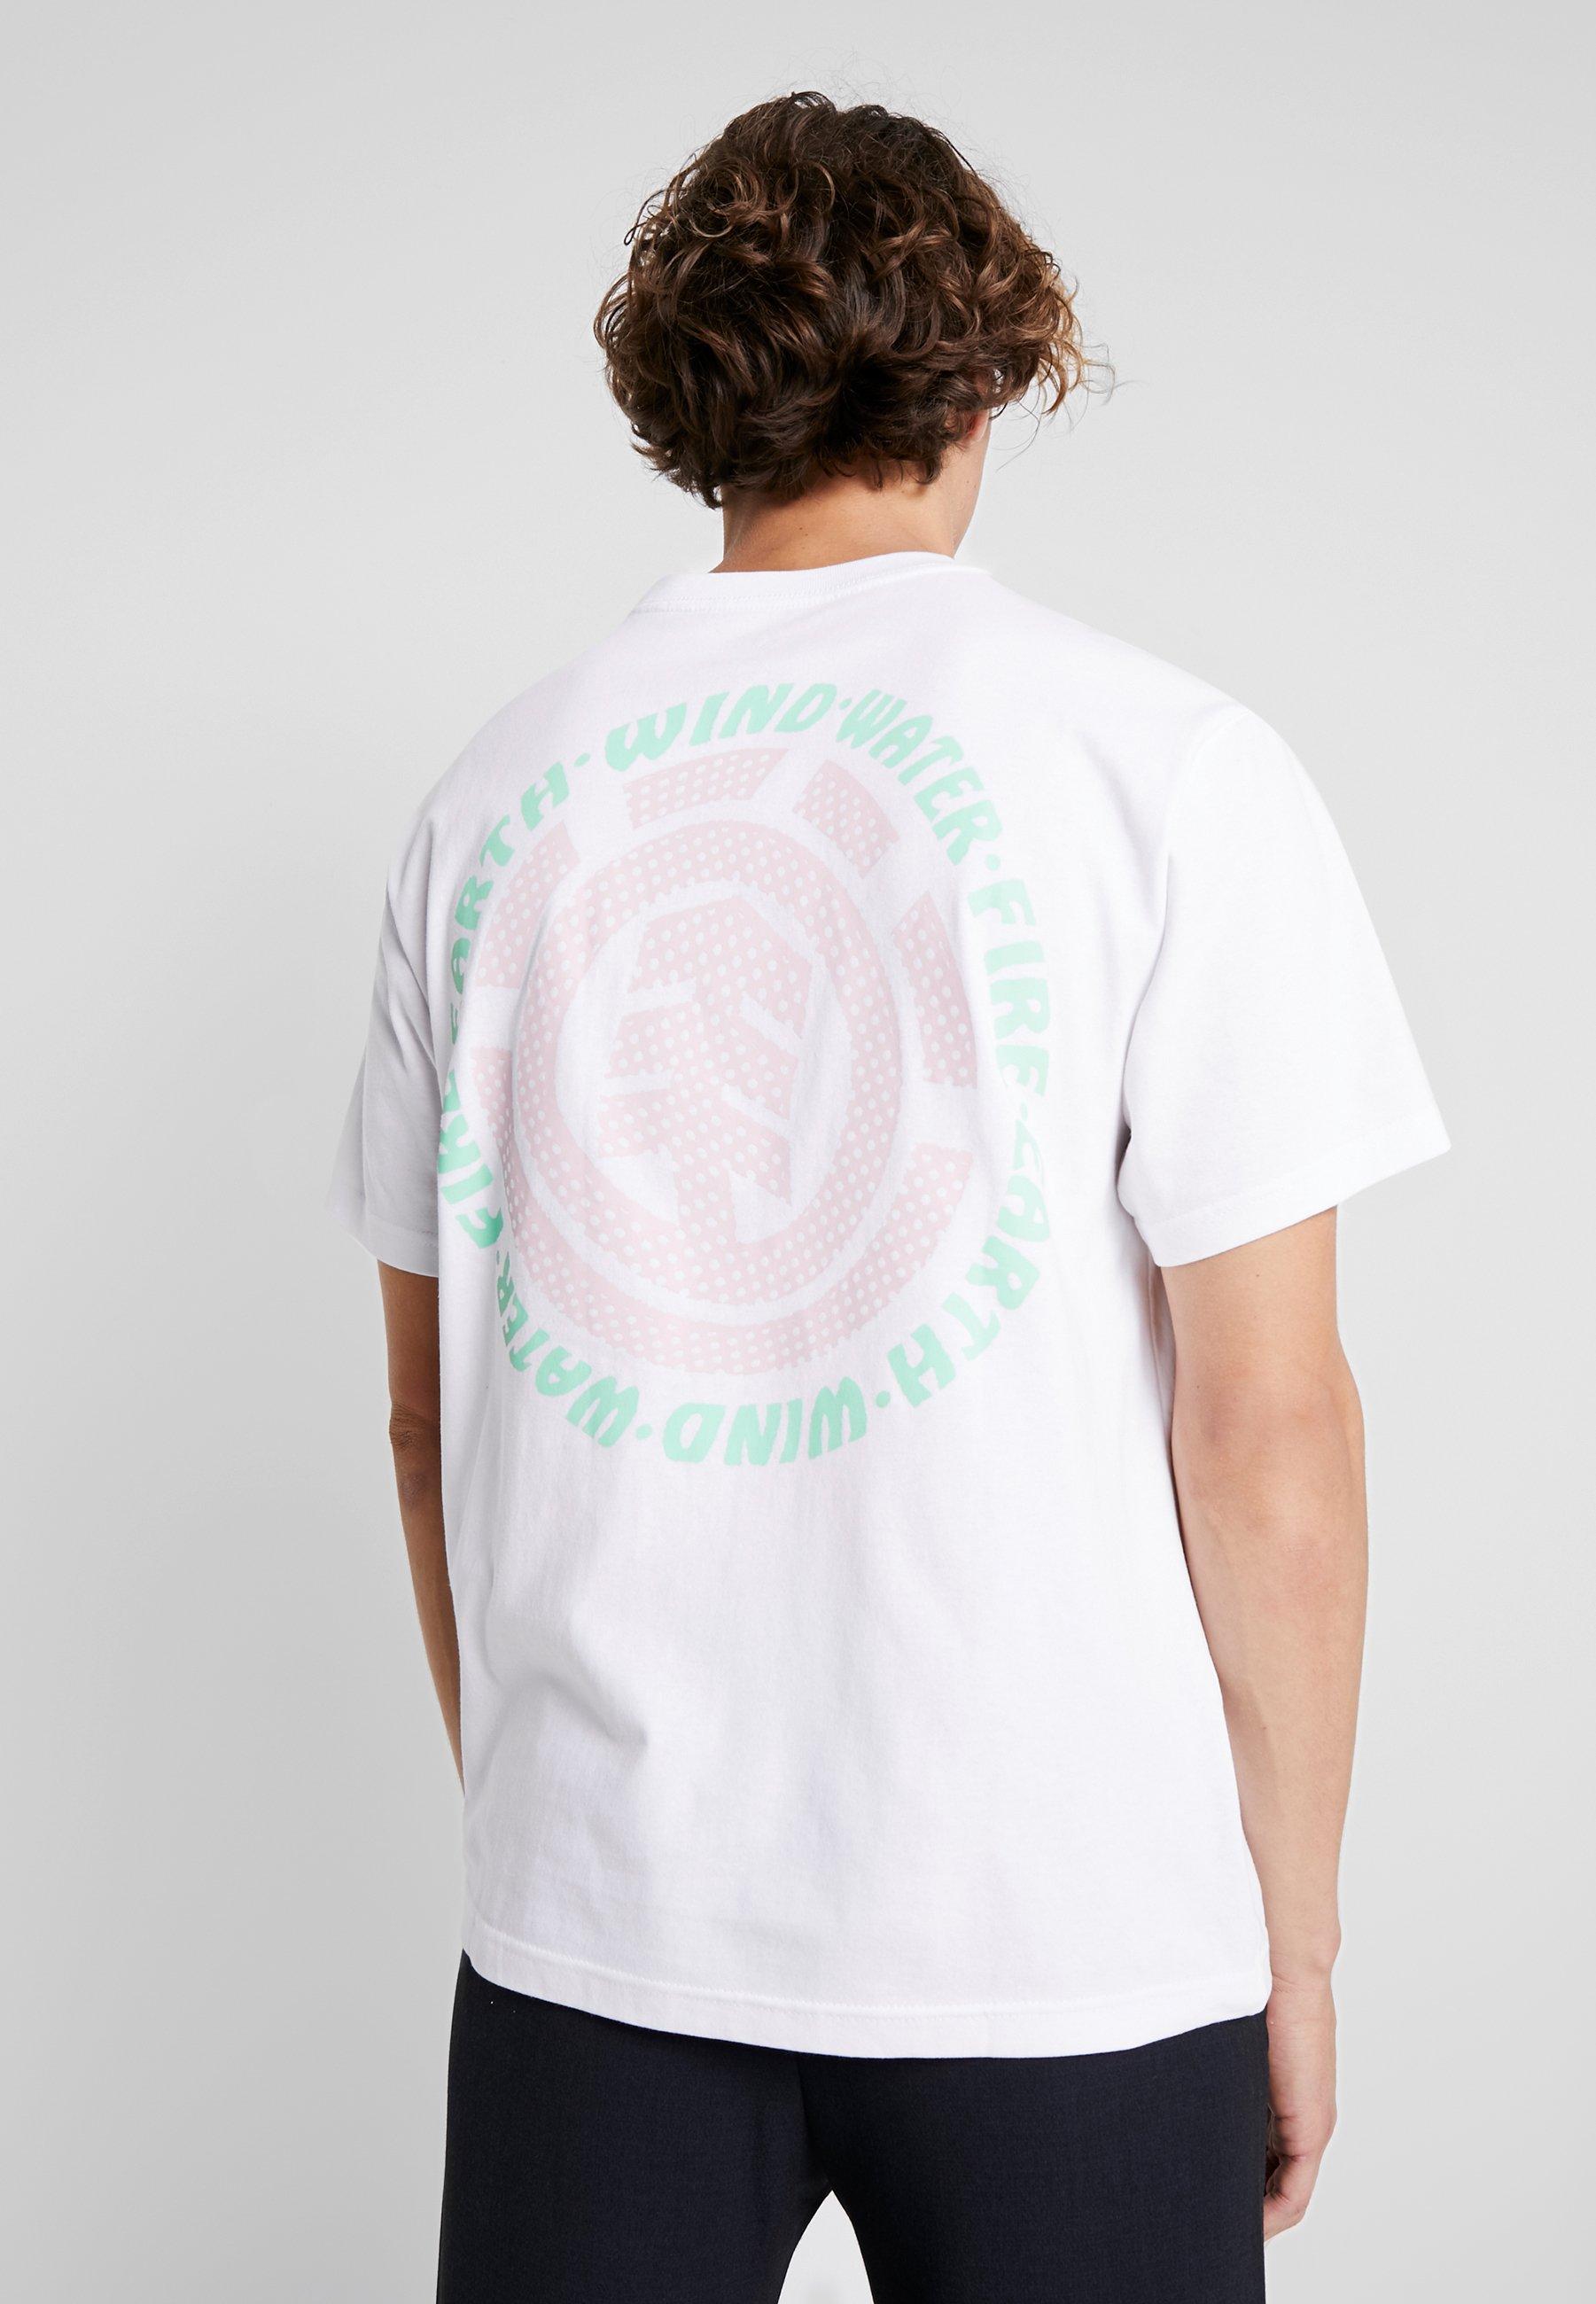 Optic White shirt DottedT Imprimé Element lc13FKJuT5